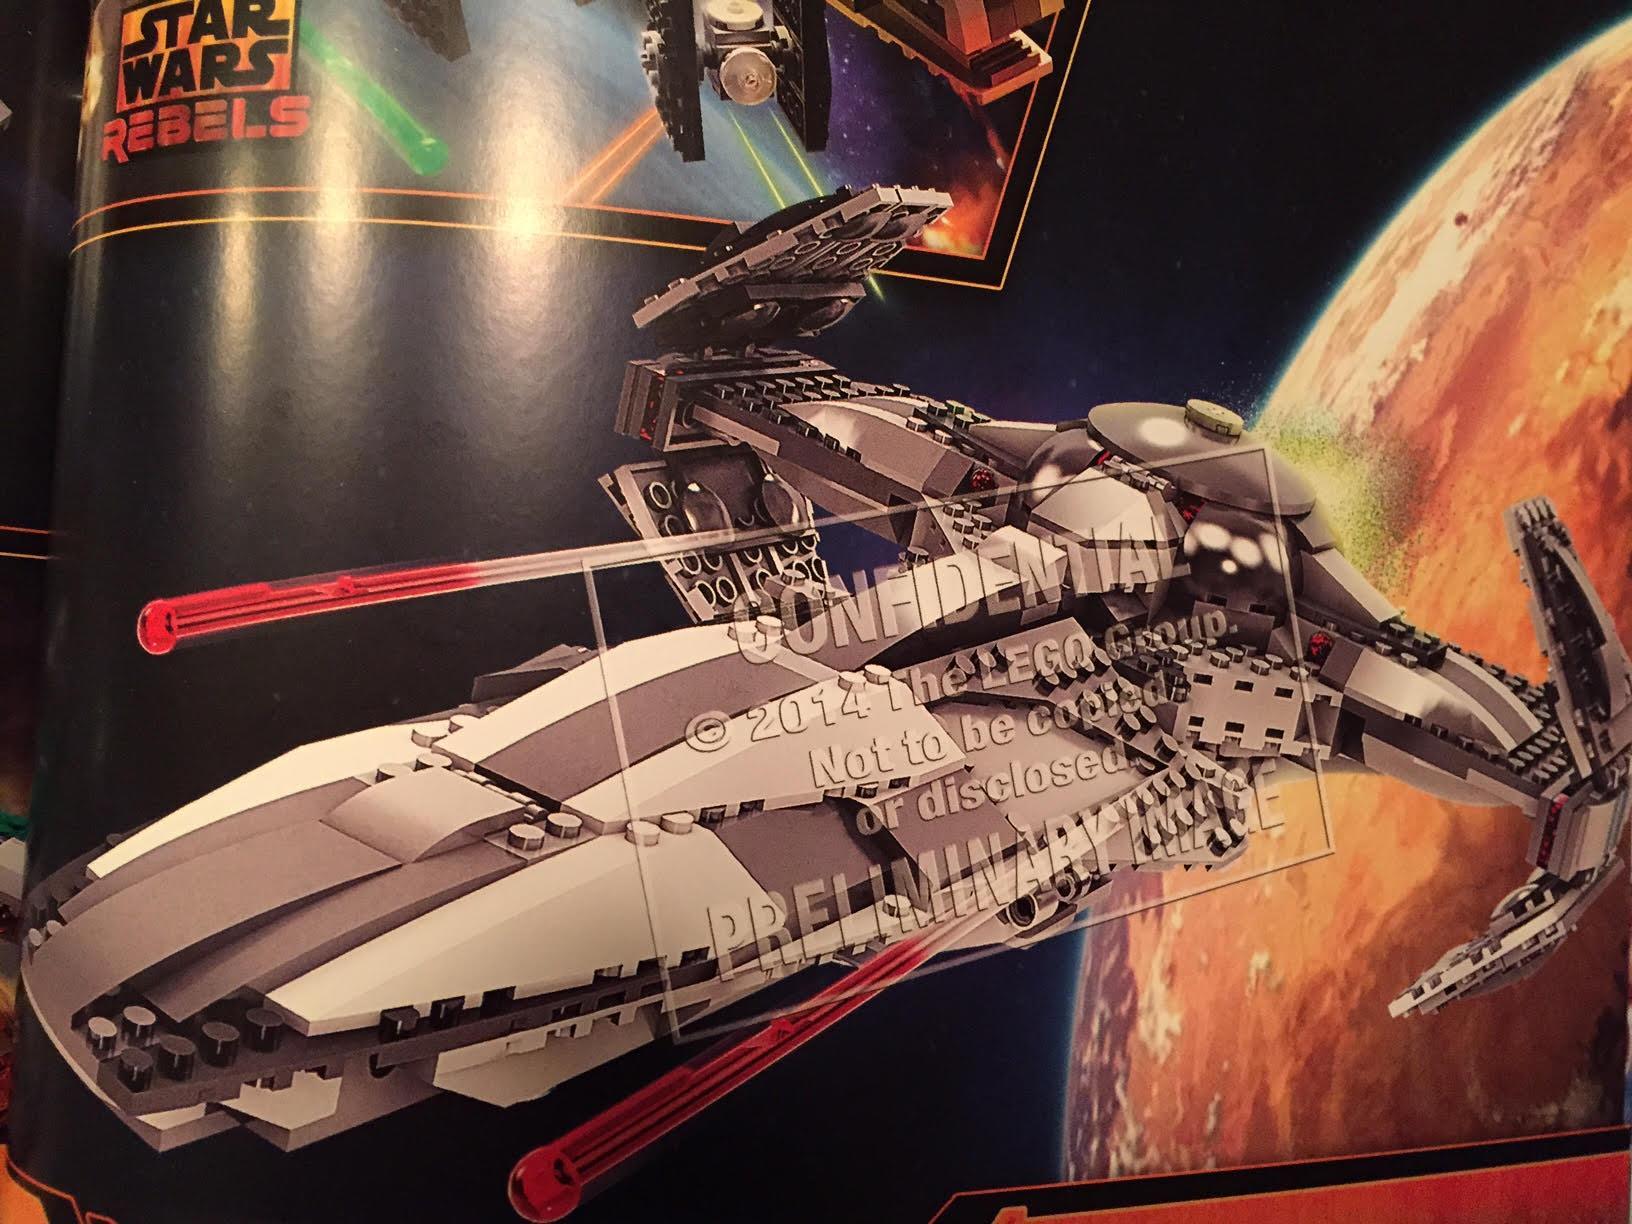 Lego Star Wars 75096 Sith Infiltrator